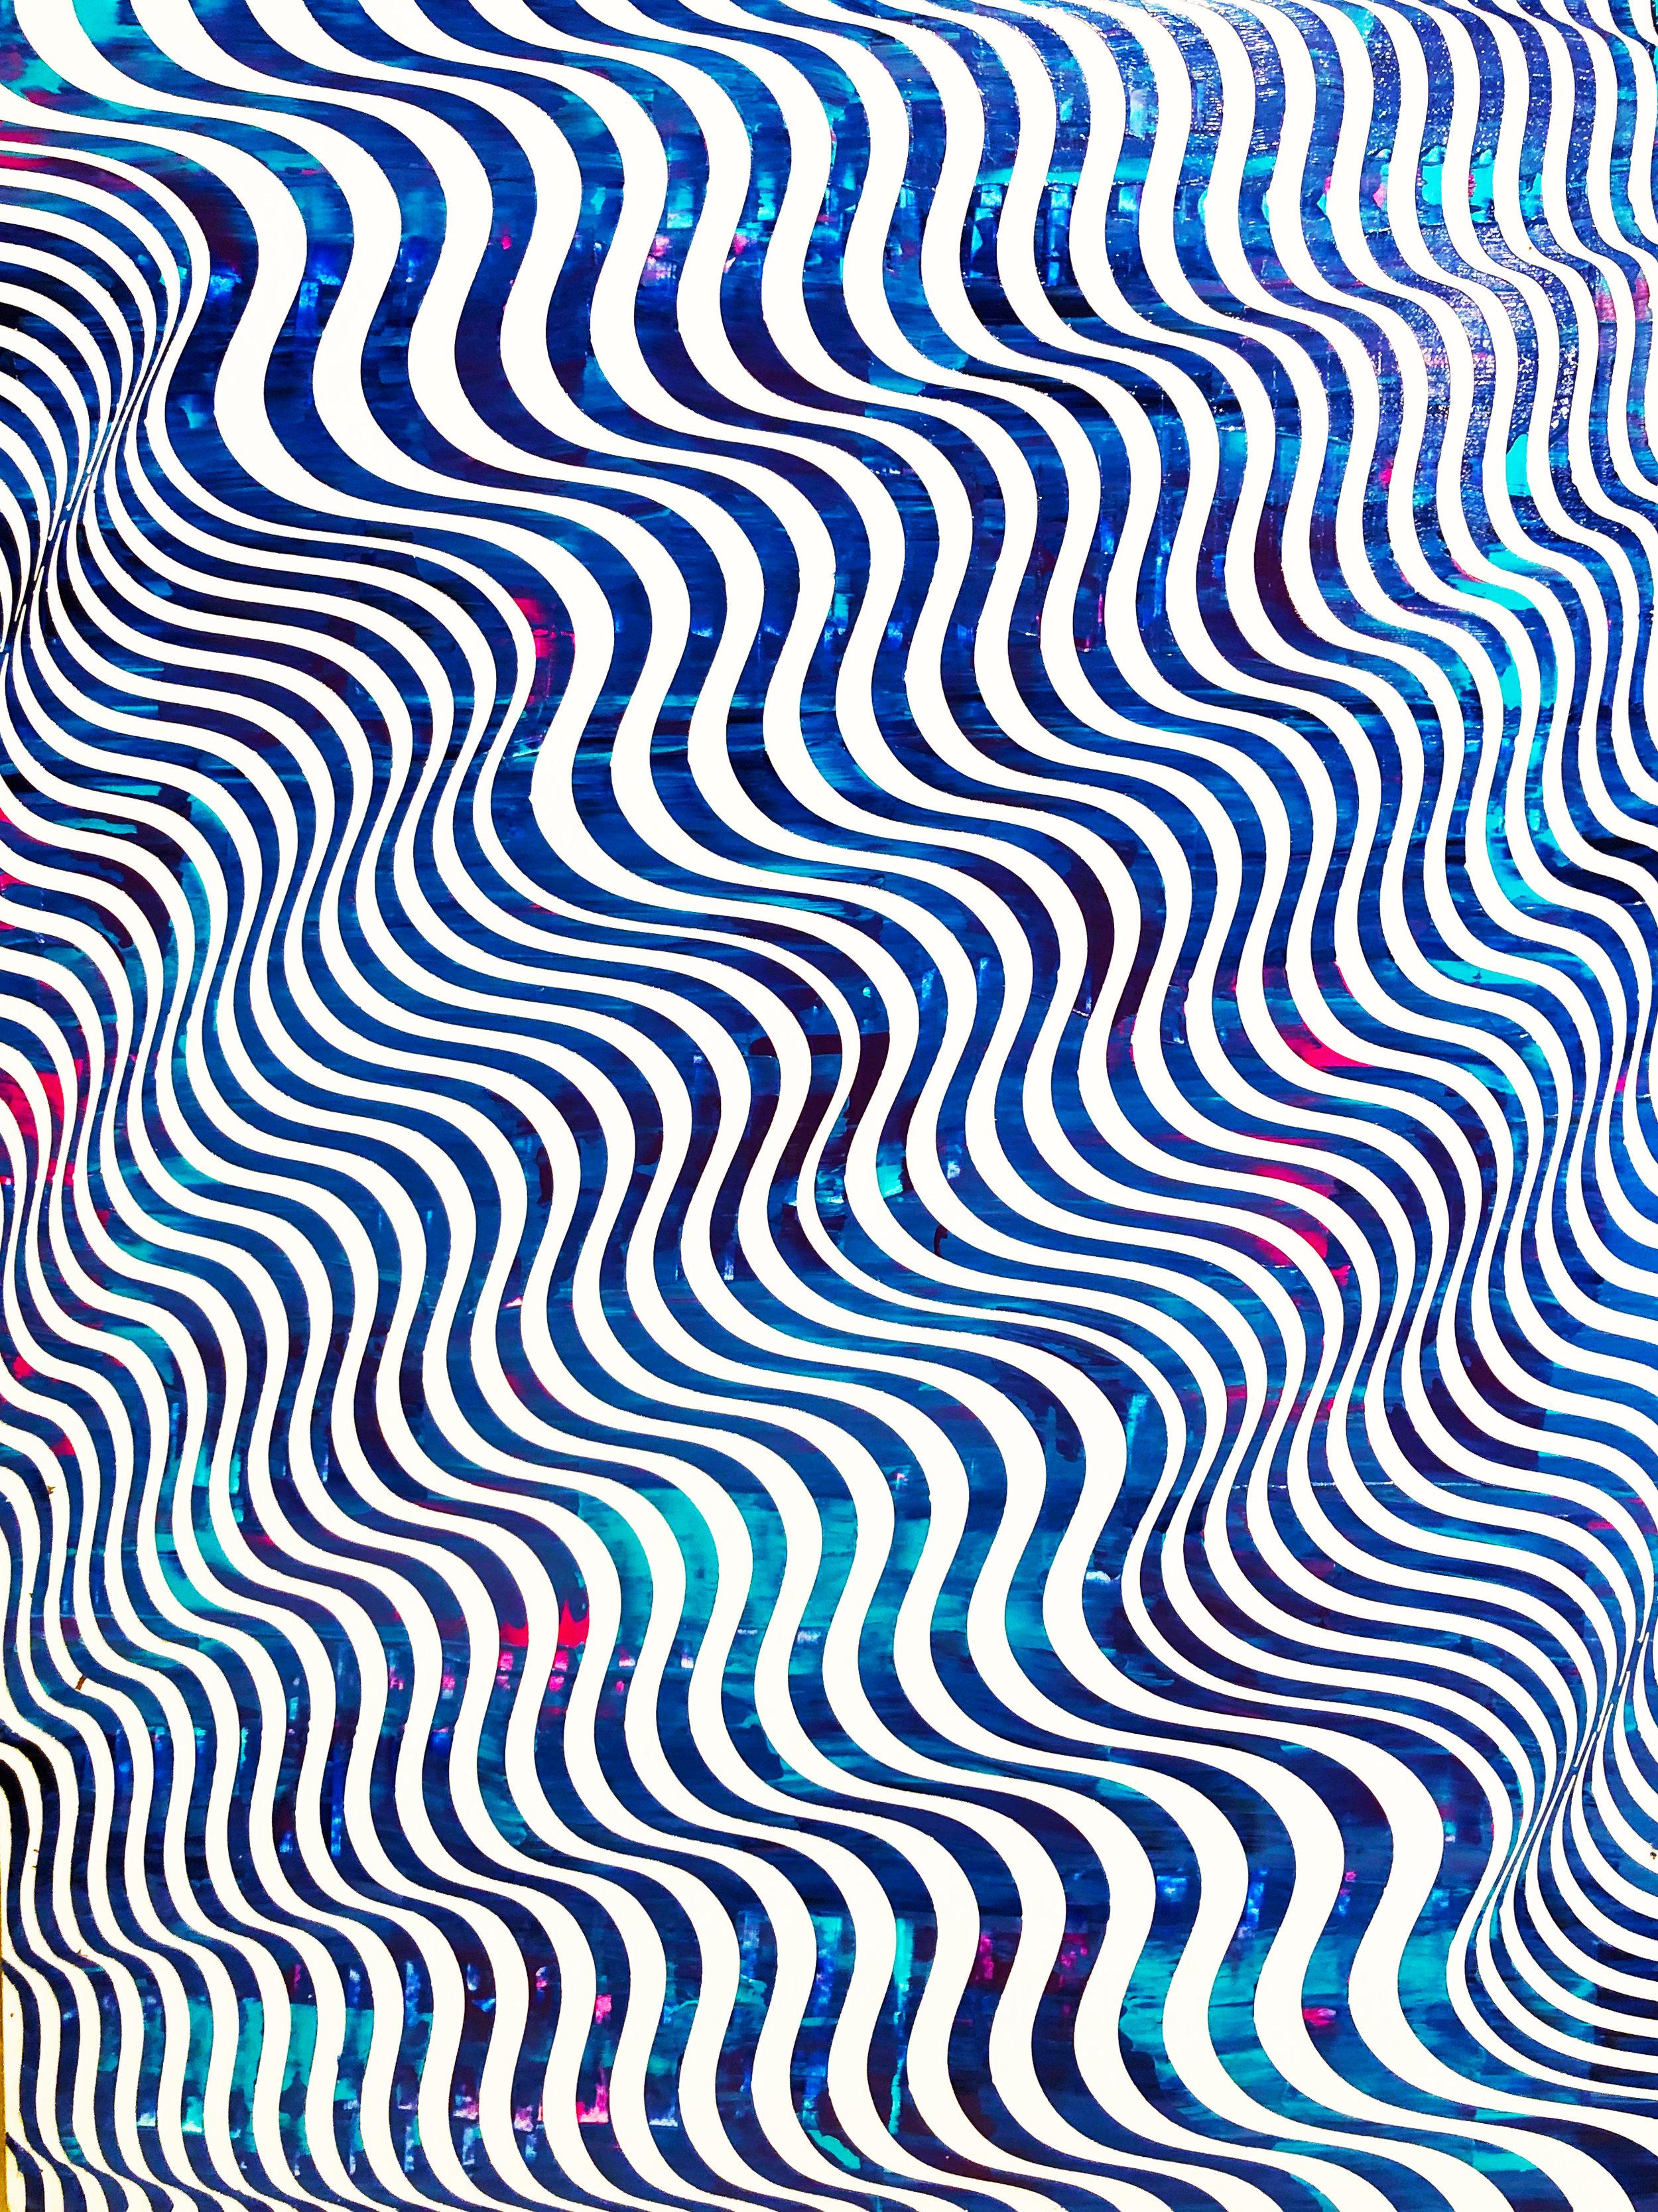 HUE Gallery of Contemporary Art - Sean Christopher Ward - Aquatic Rift - Acrylic on MDF - 12x16 - 2018 - $375.JPG